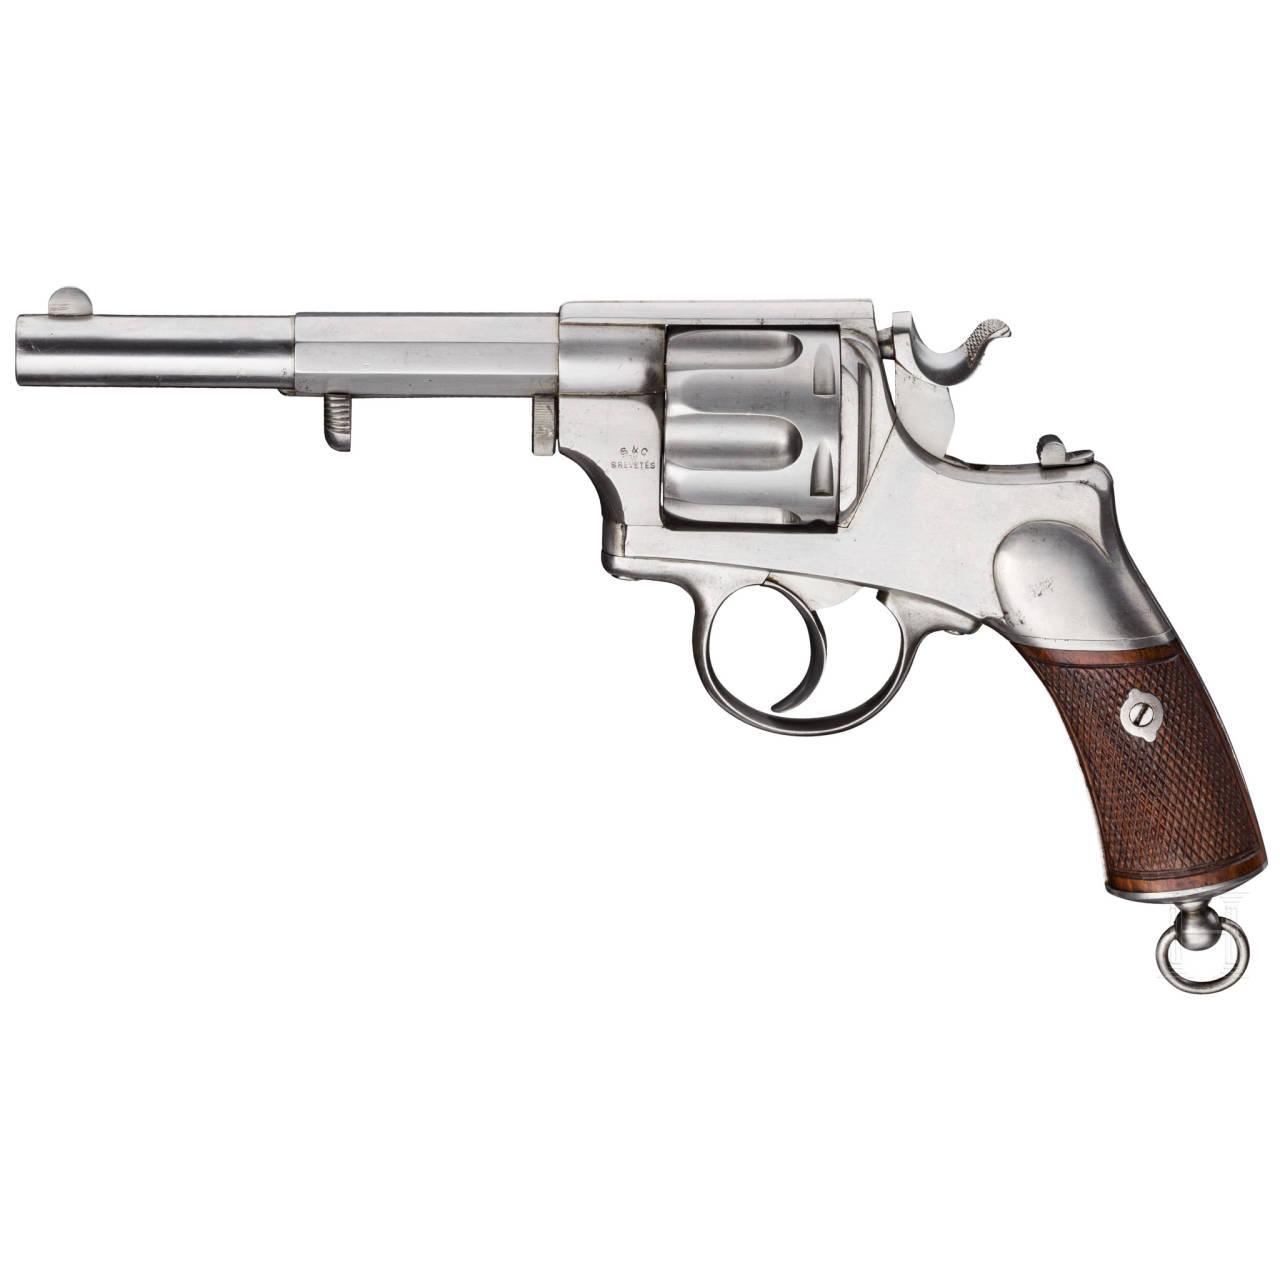 A Warnant, Scholberg & Gadet revolver system, Liège, prototype (?) for the KSKM